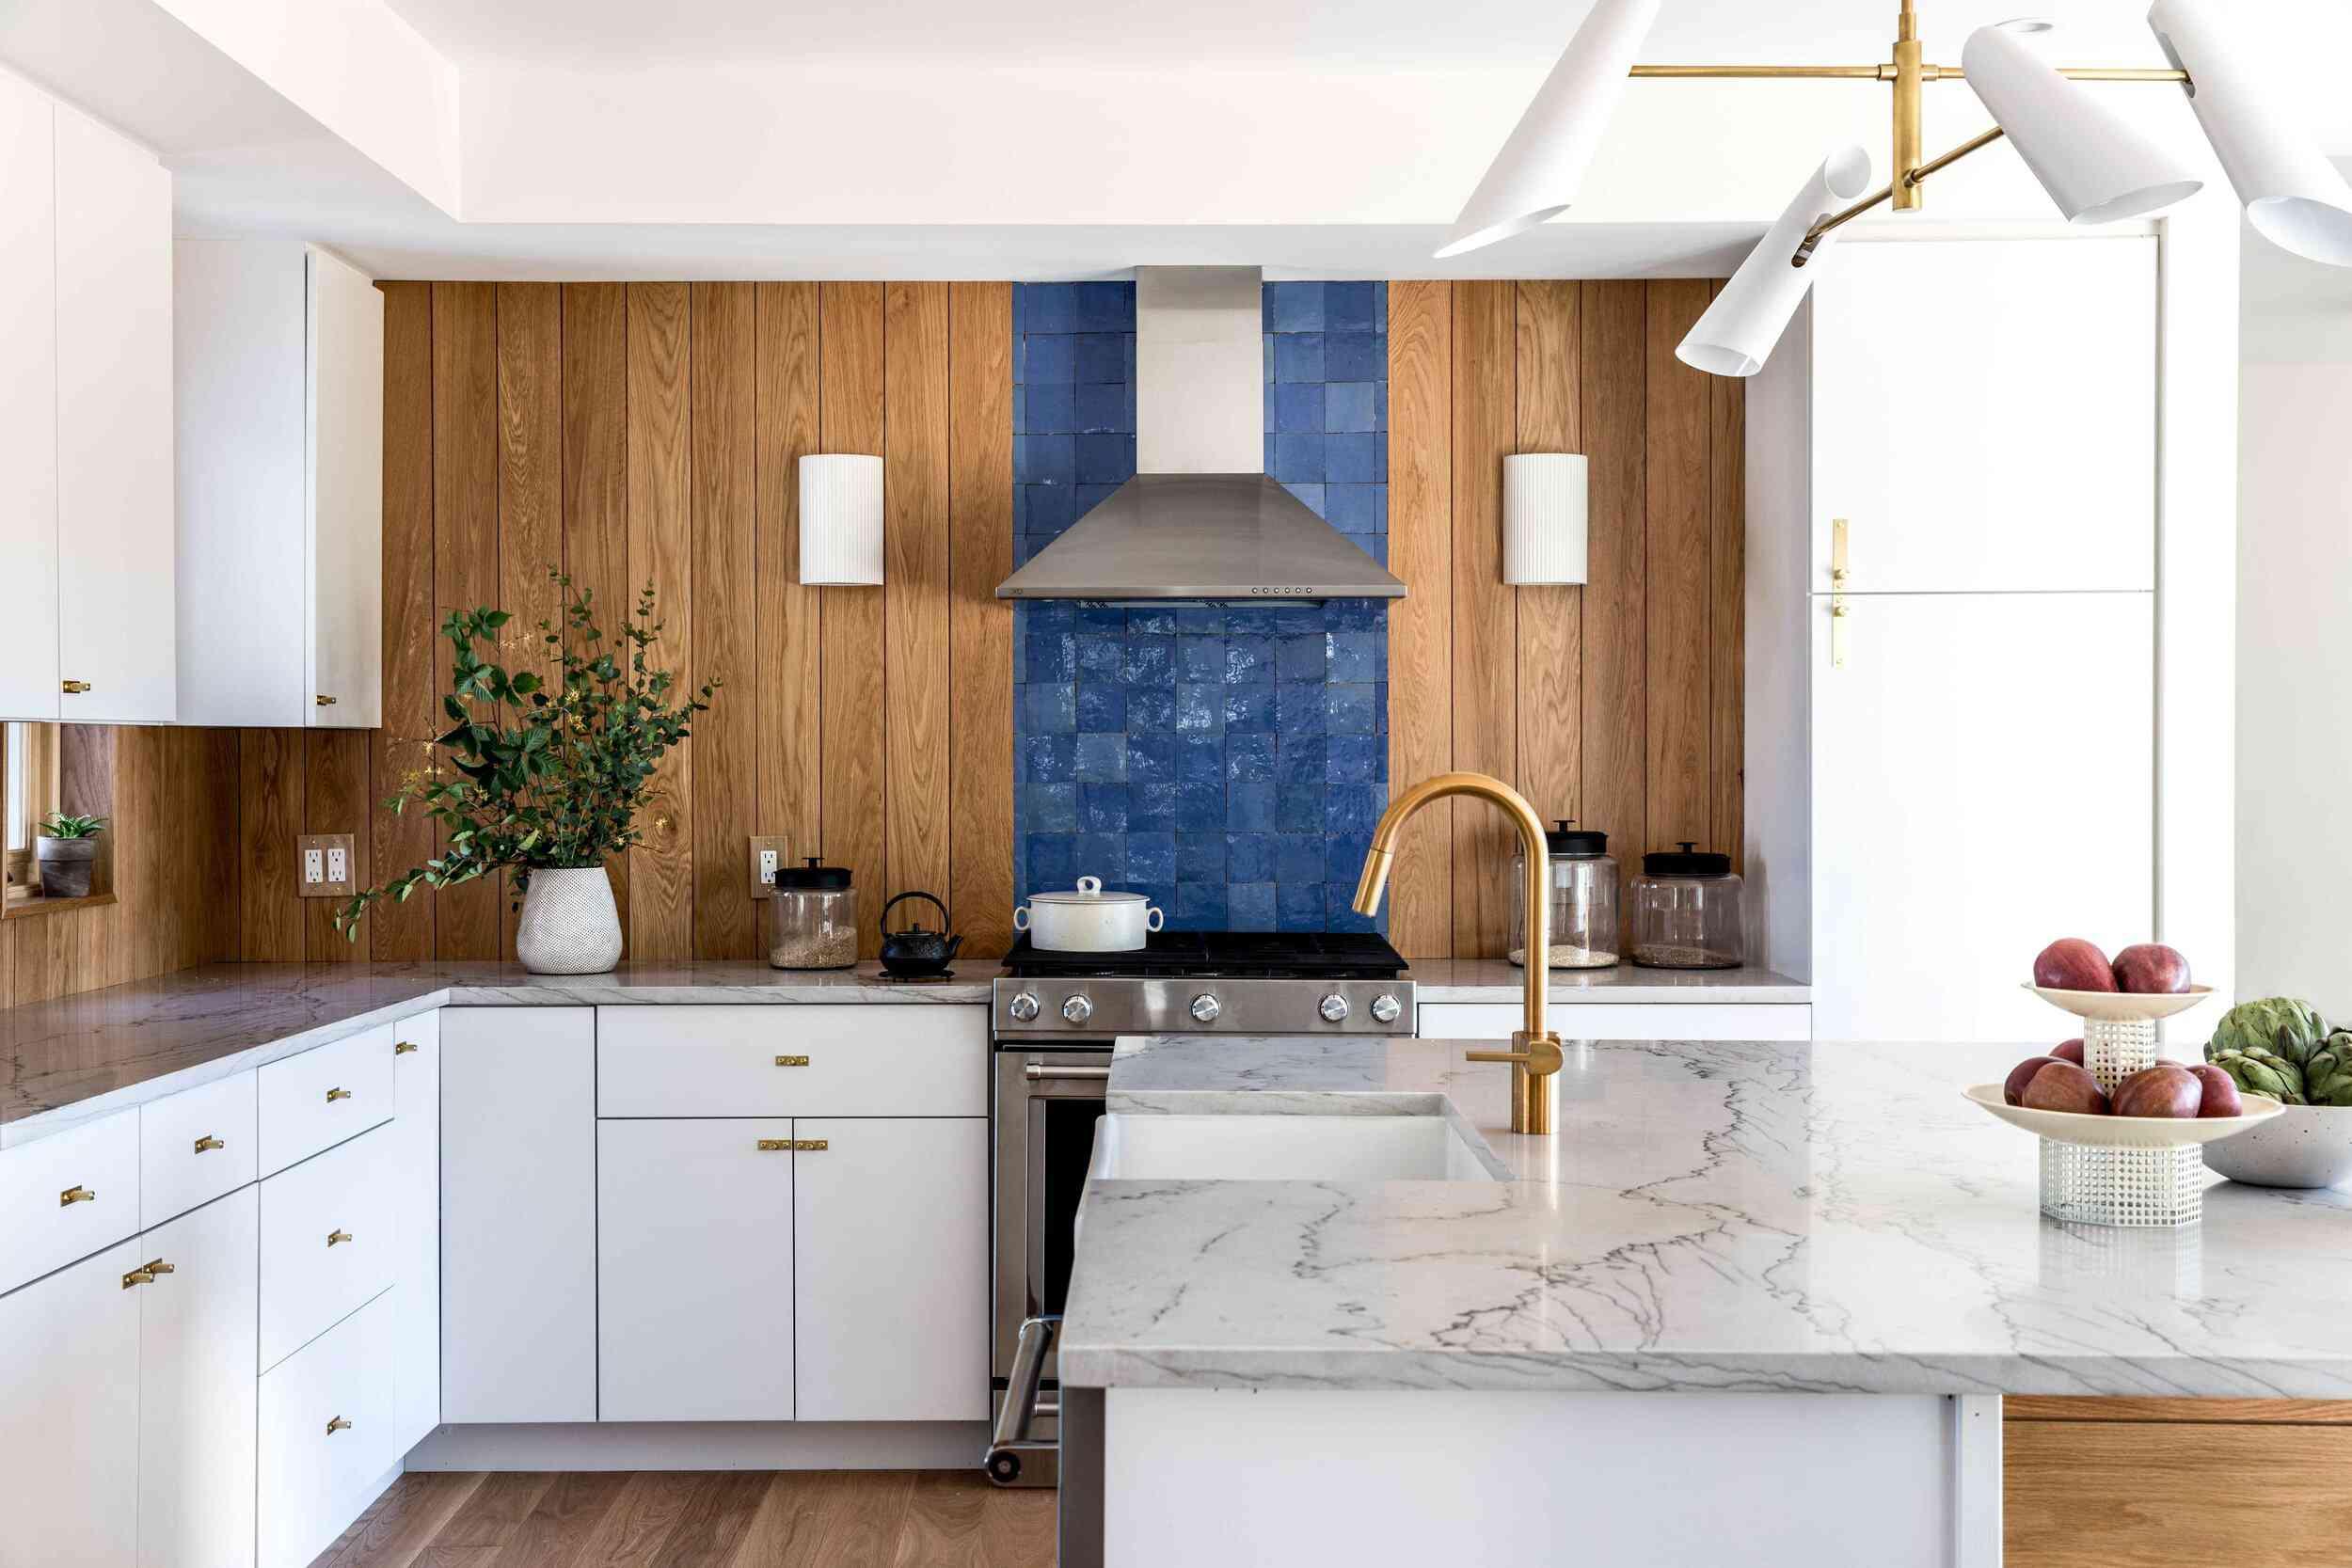 Modern kitchen with wood panel backsplash